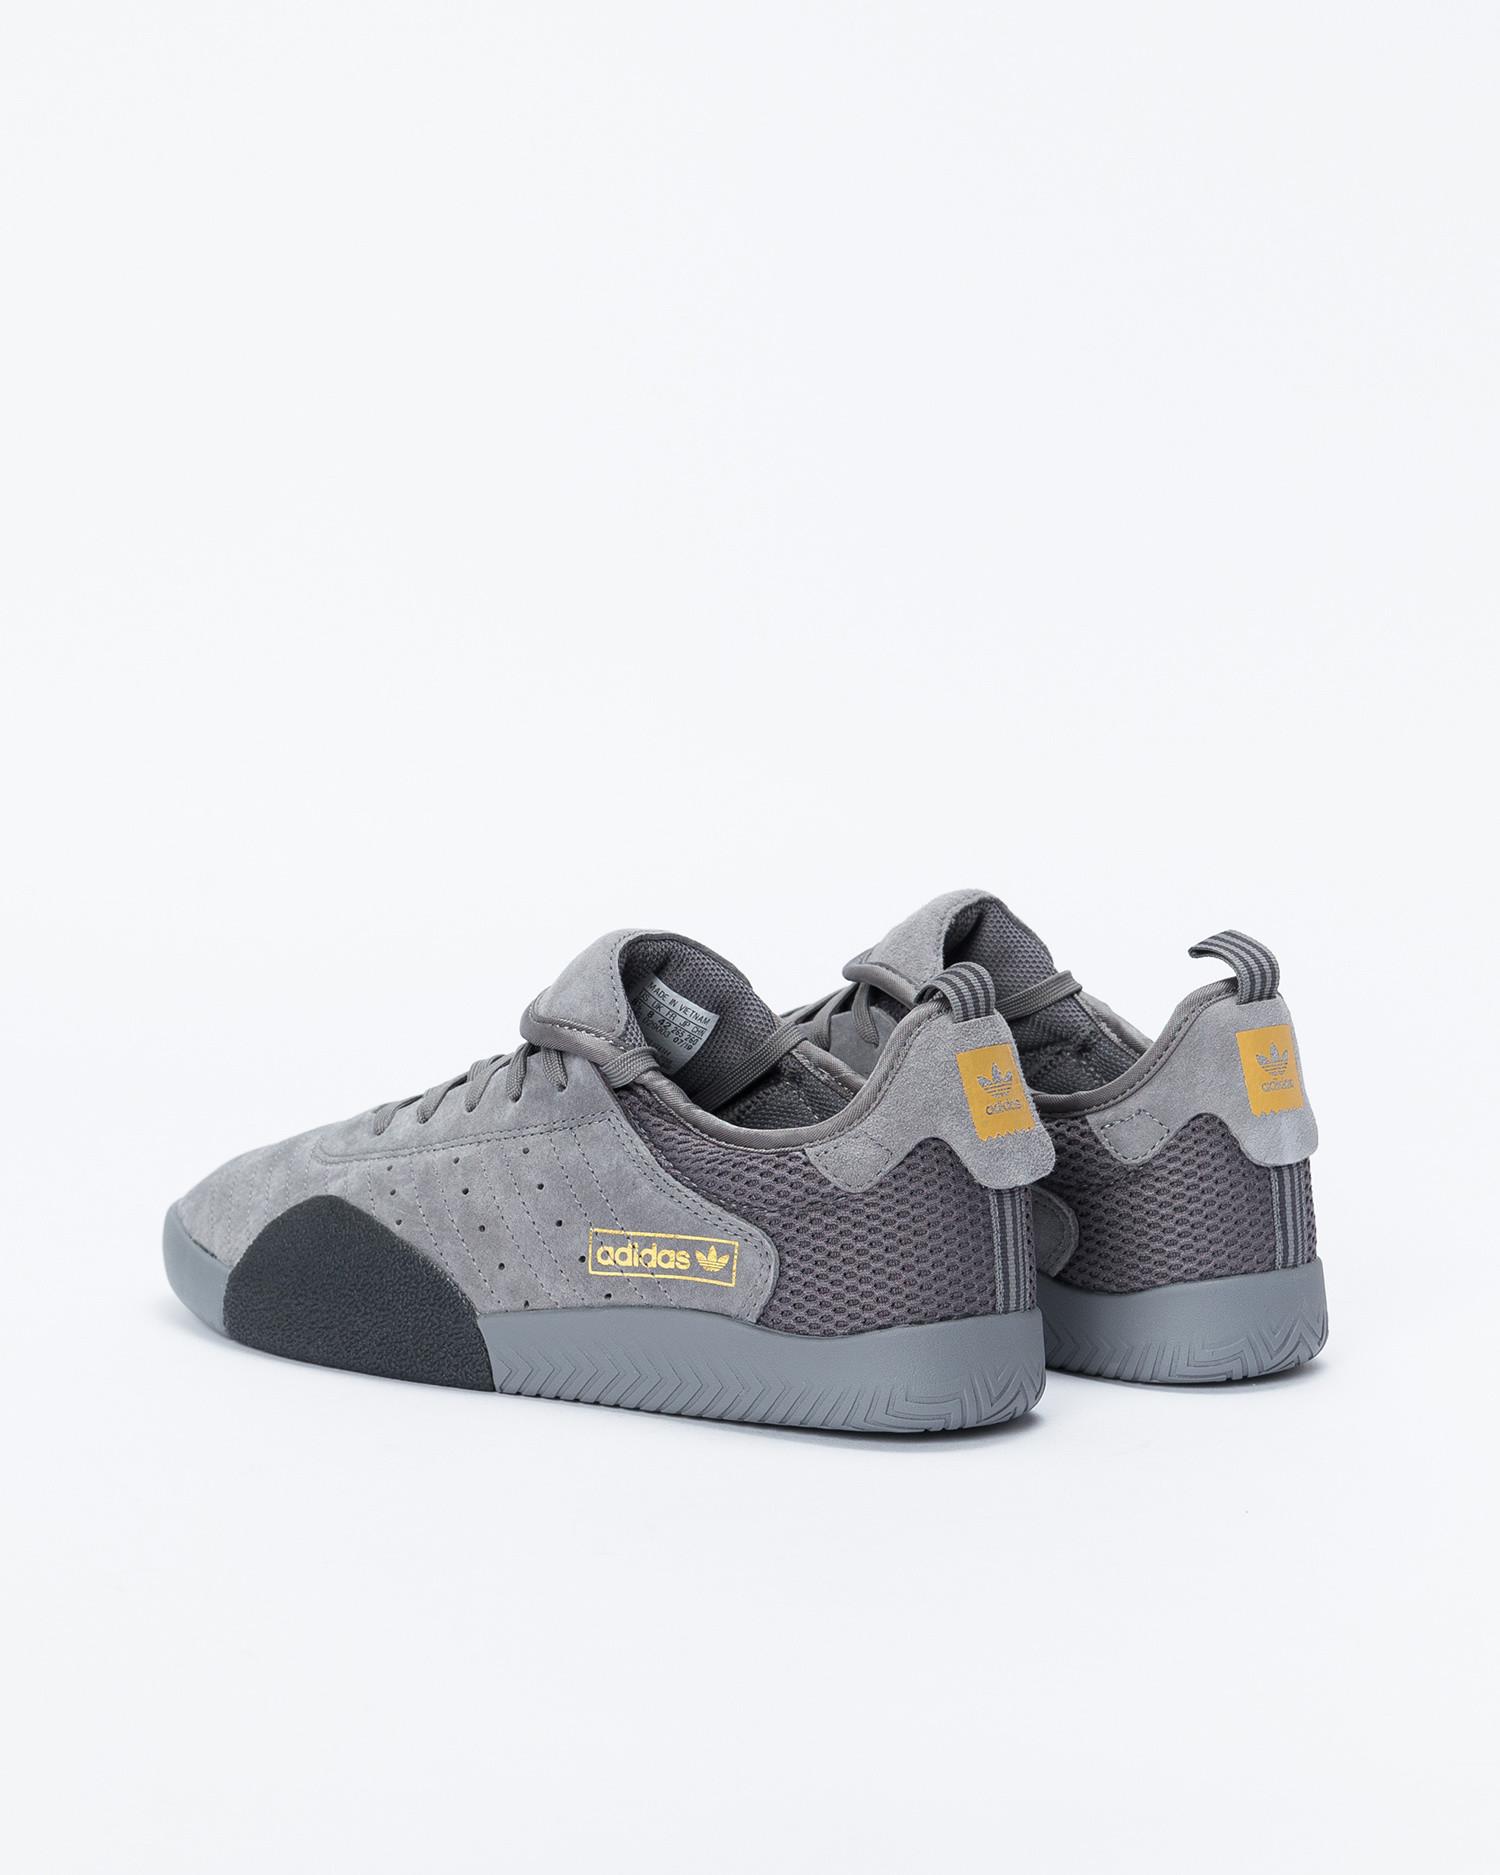 Adidas 3st.003 Grey Four / Carbon / Gold Metallic